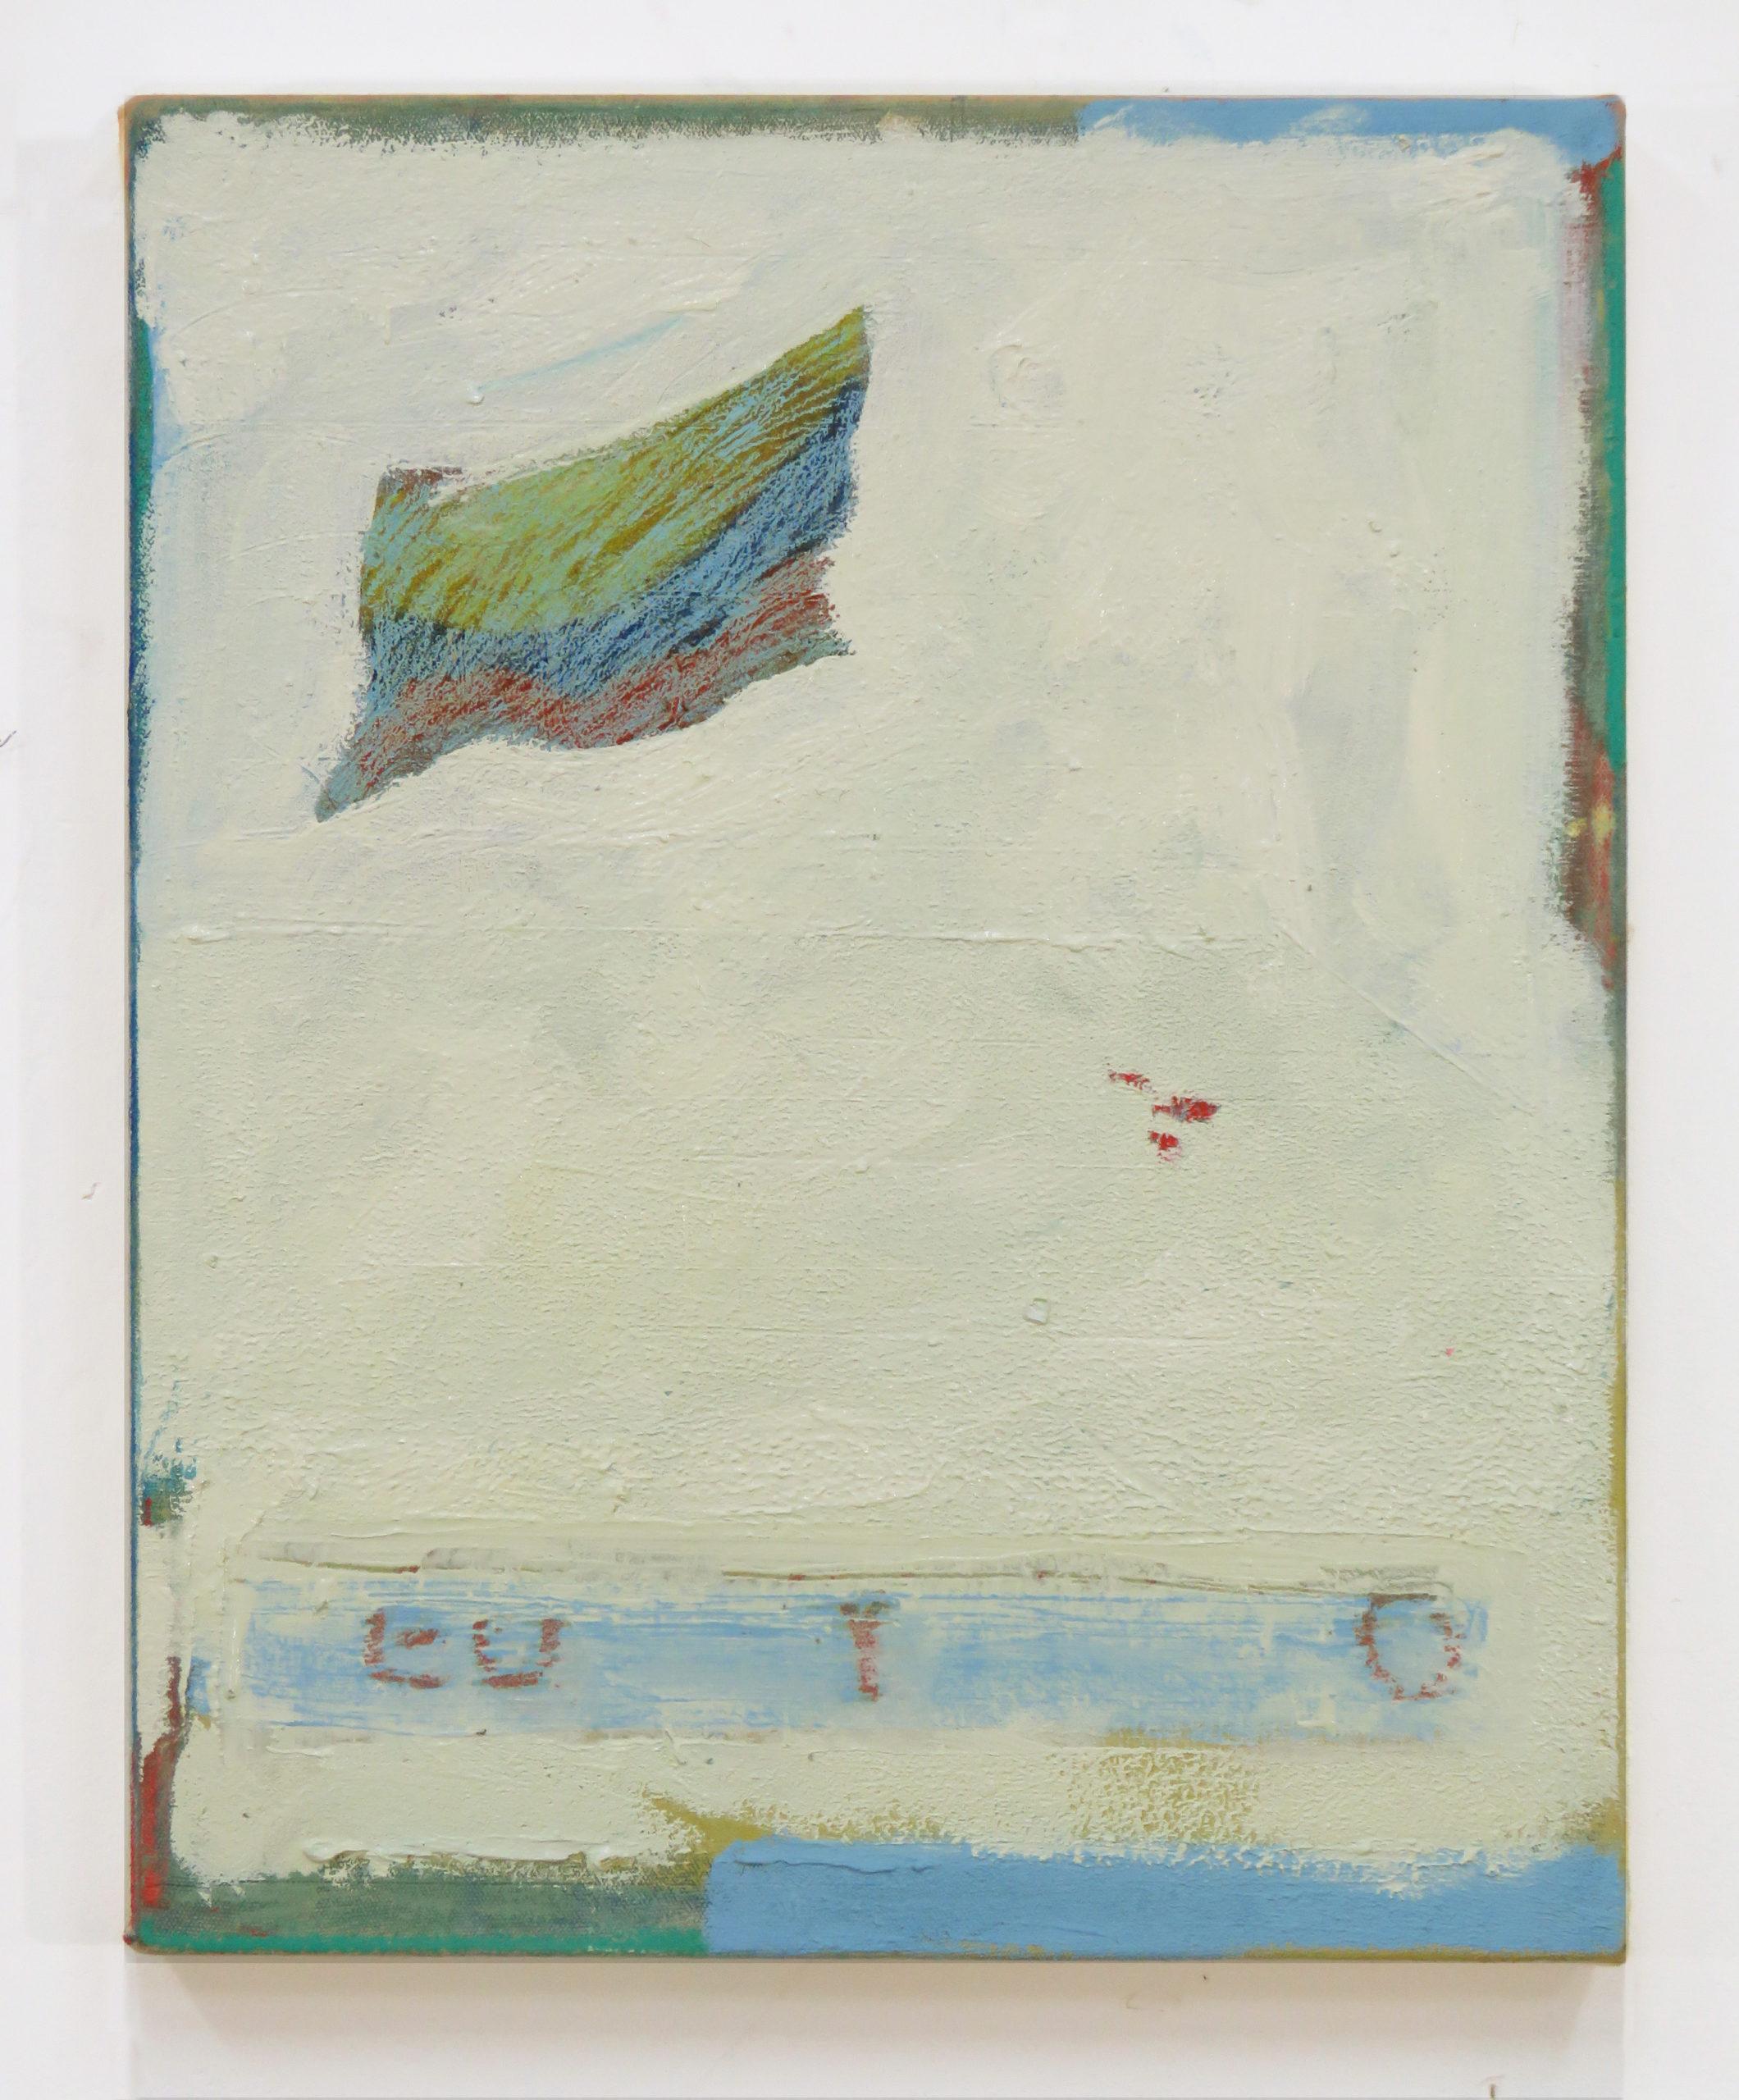 Bandera, 2019, Oil on canvas, 51x 41cm